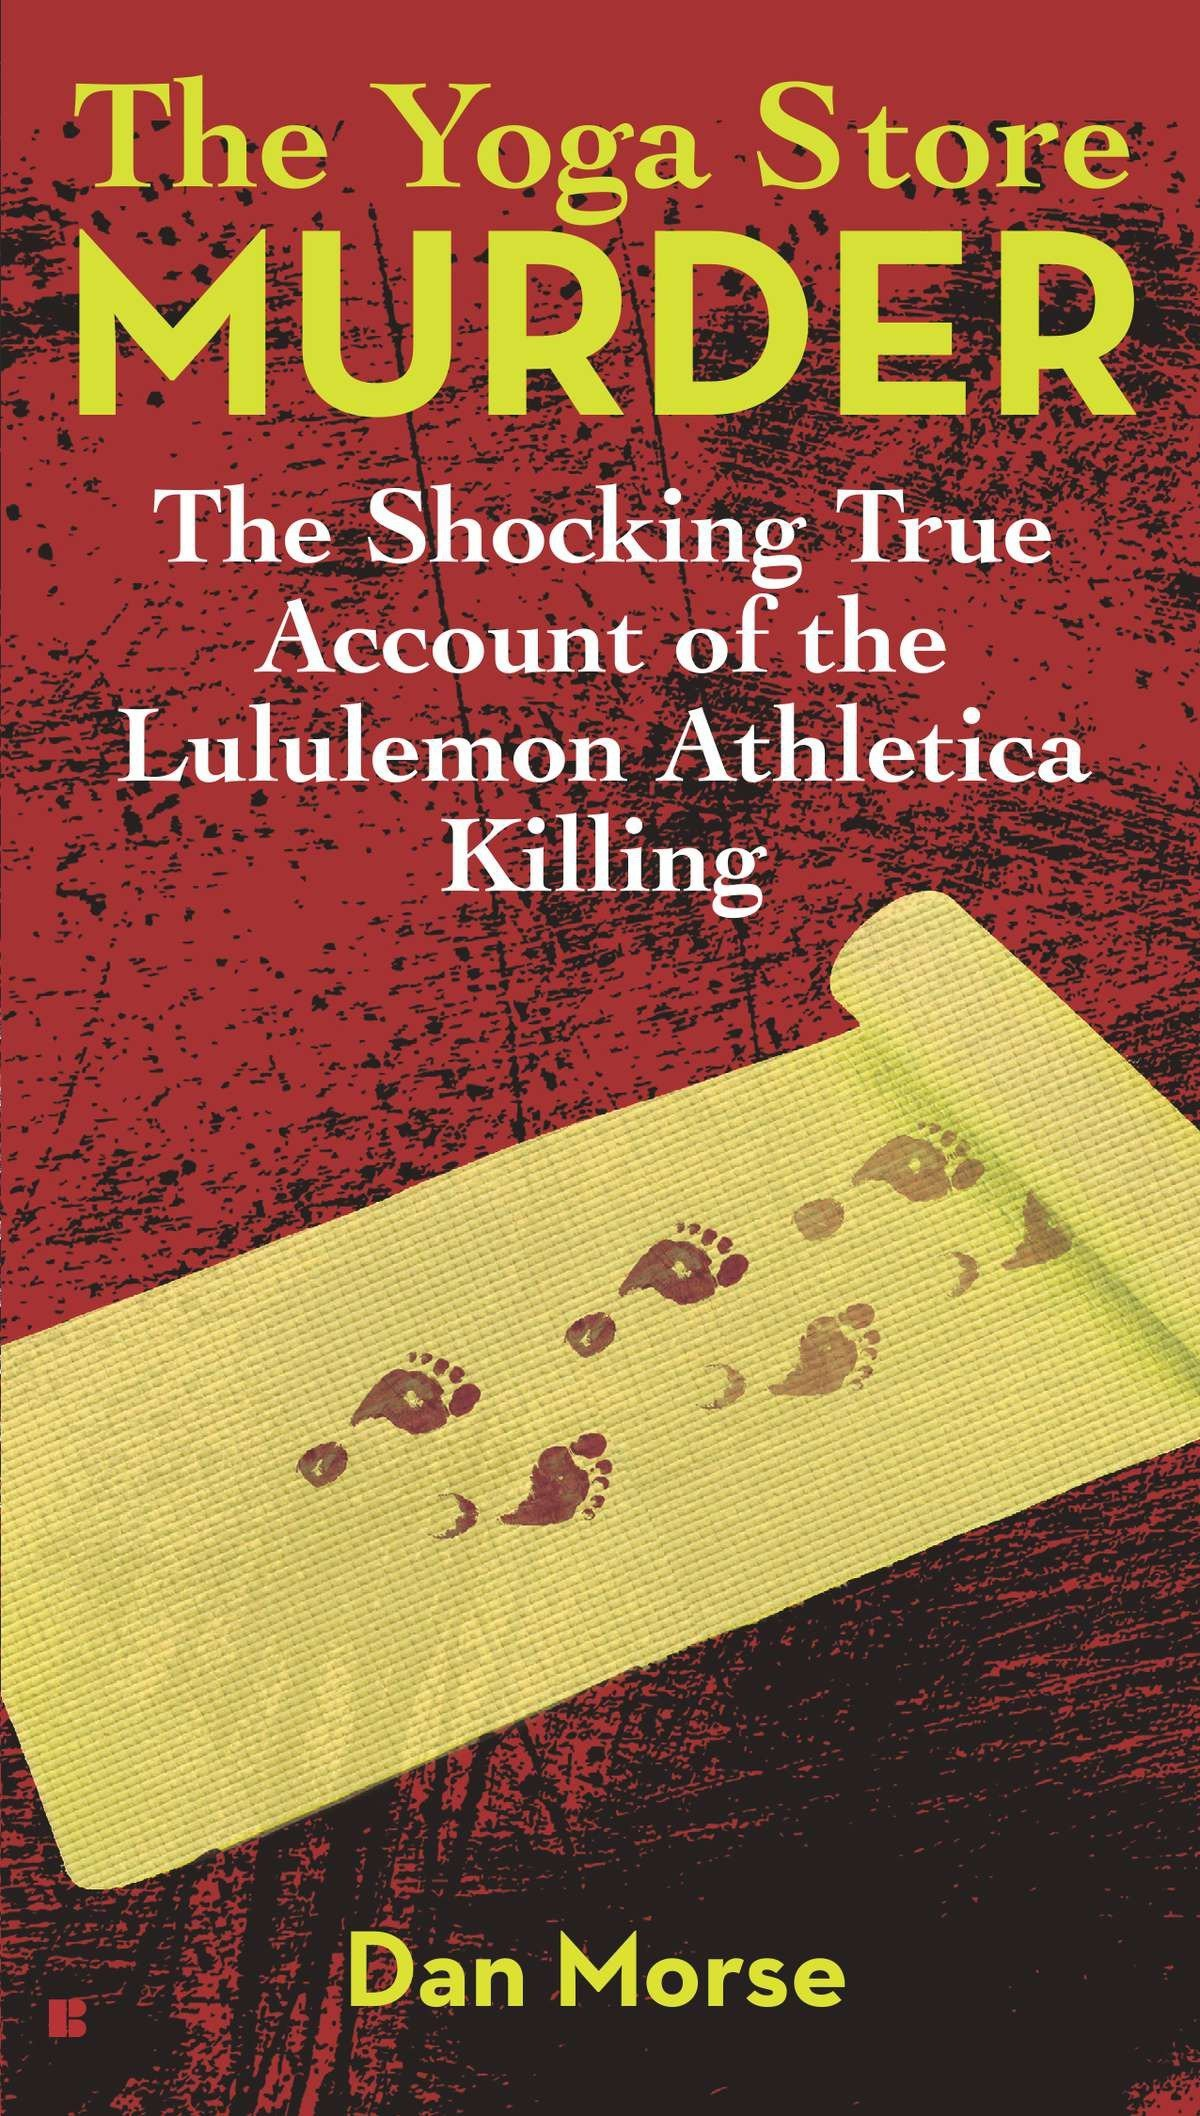 2b38e07ba2 The Yoga Store Murder: The Shocking True Account of the Lululemon ...